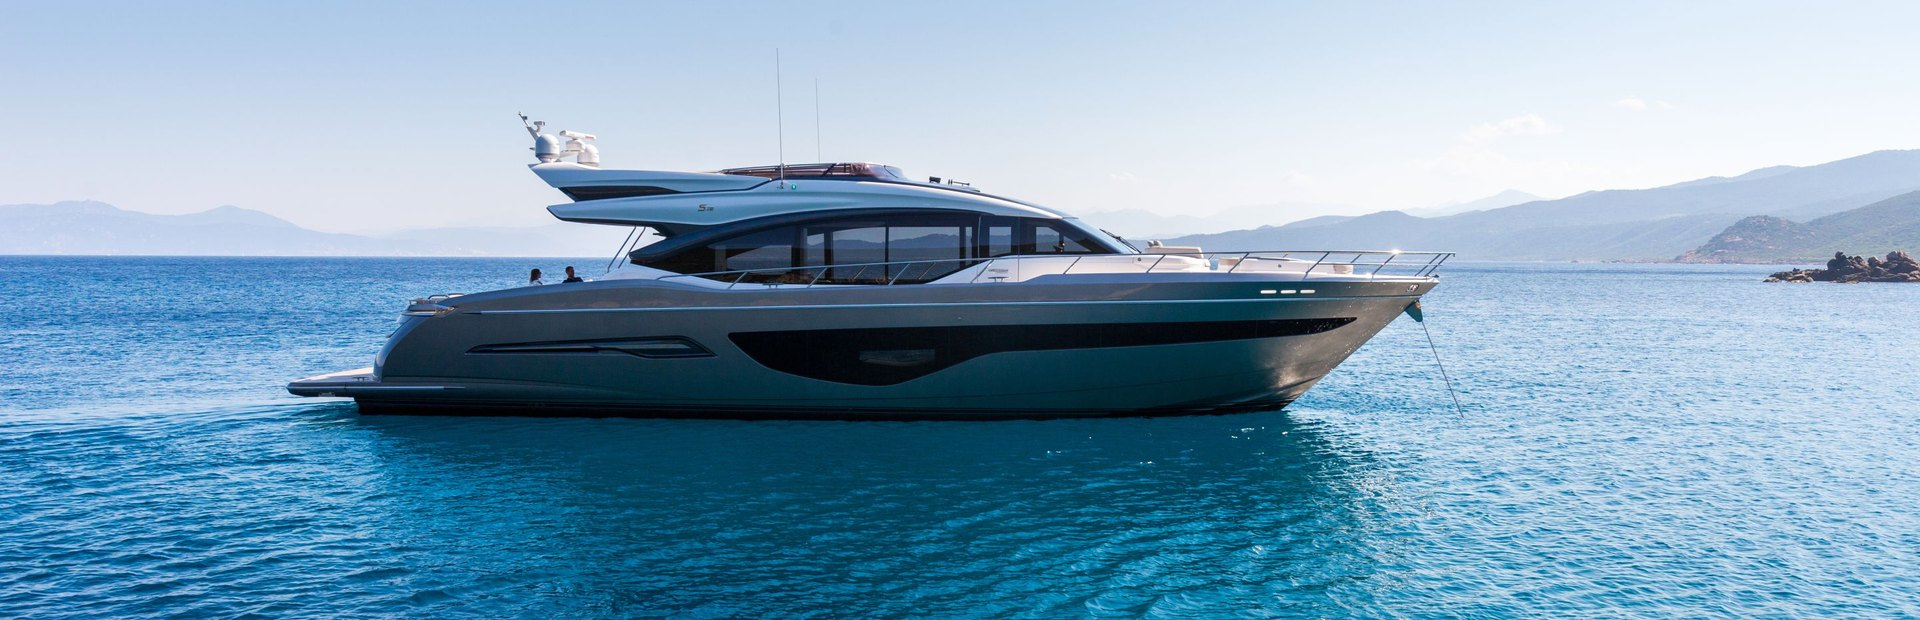 Princess S78 Yacht Charter